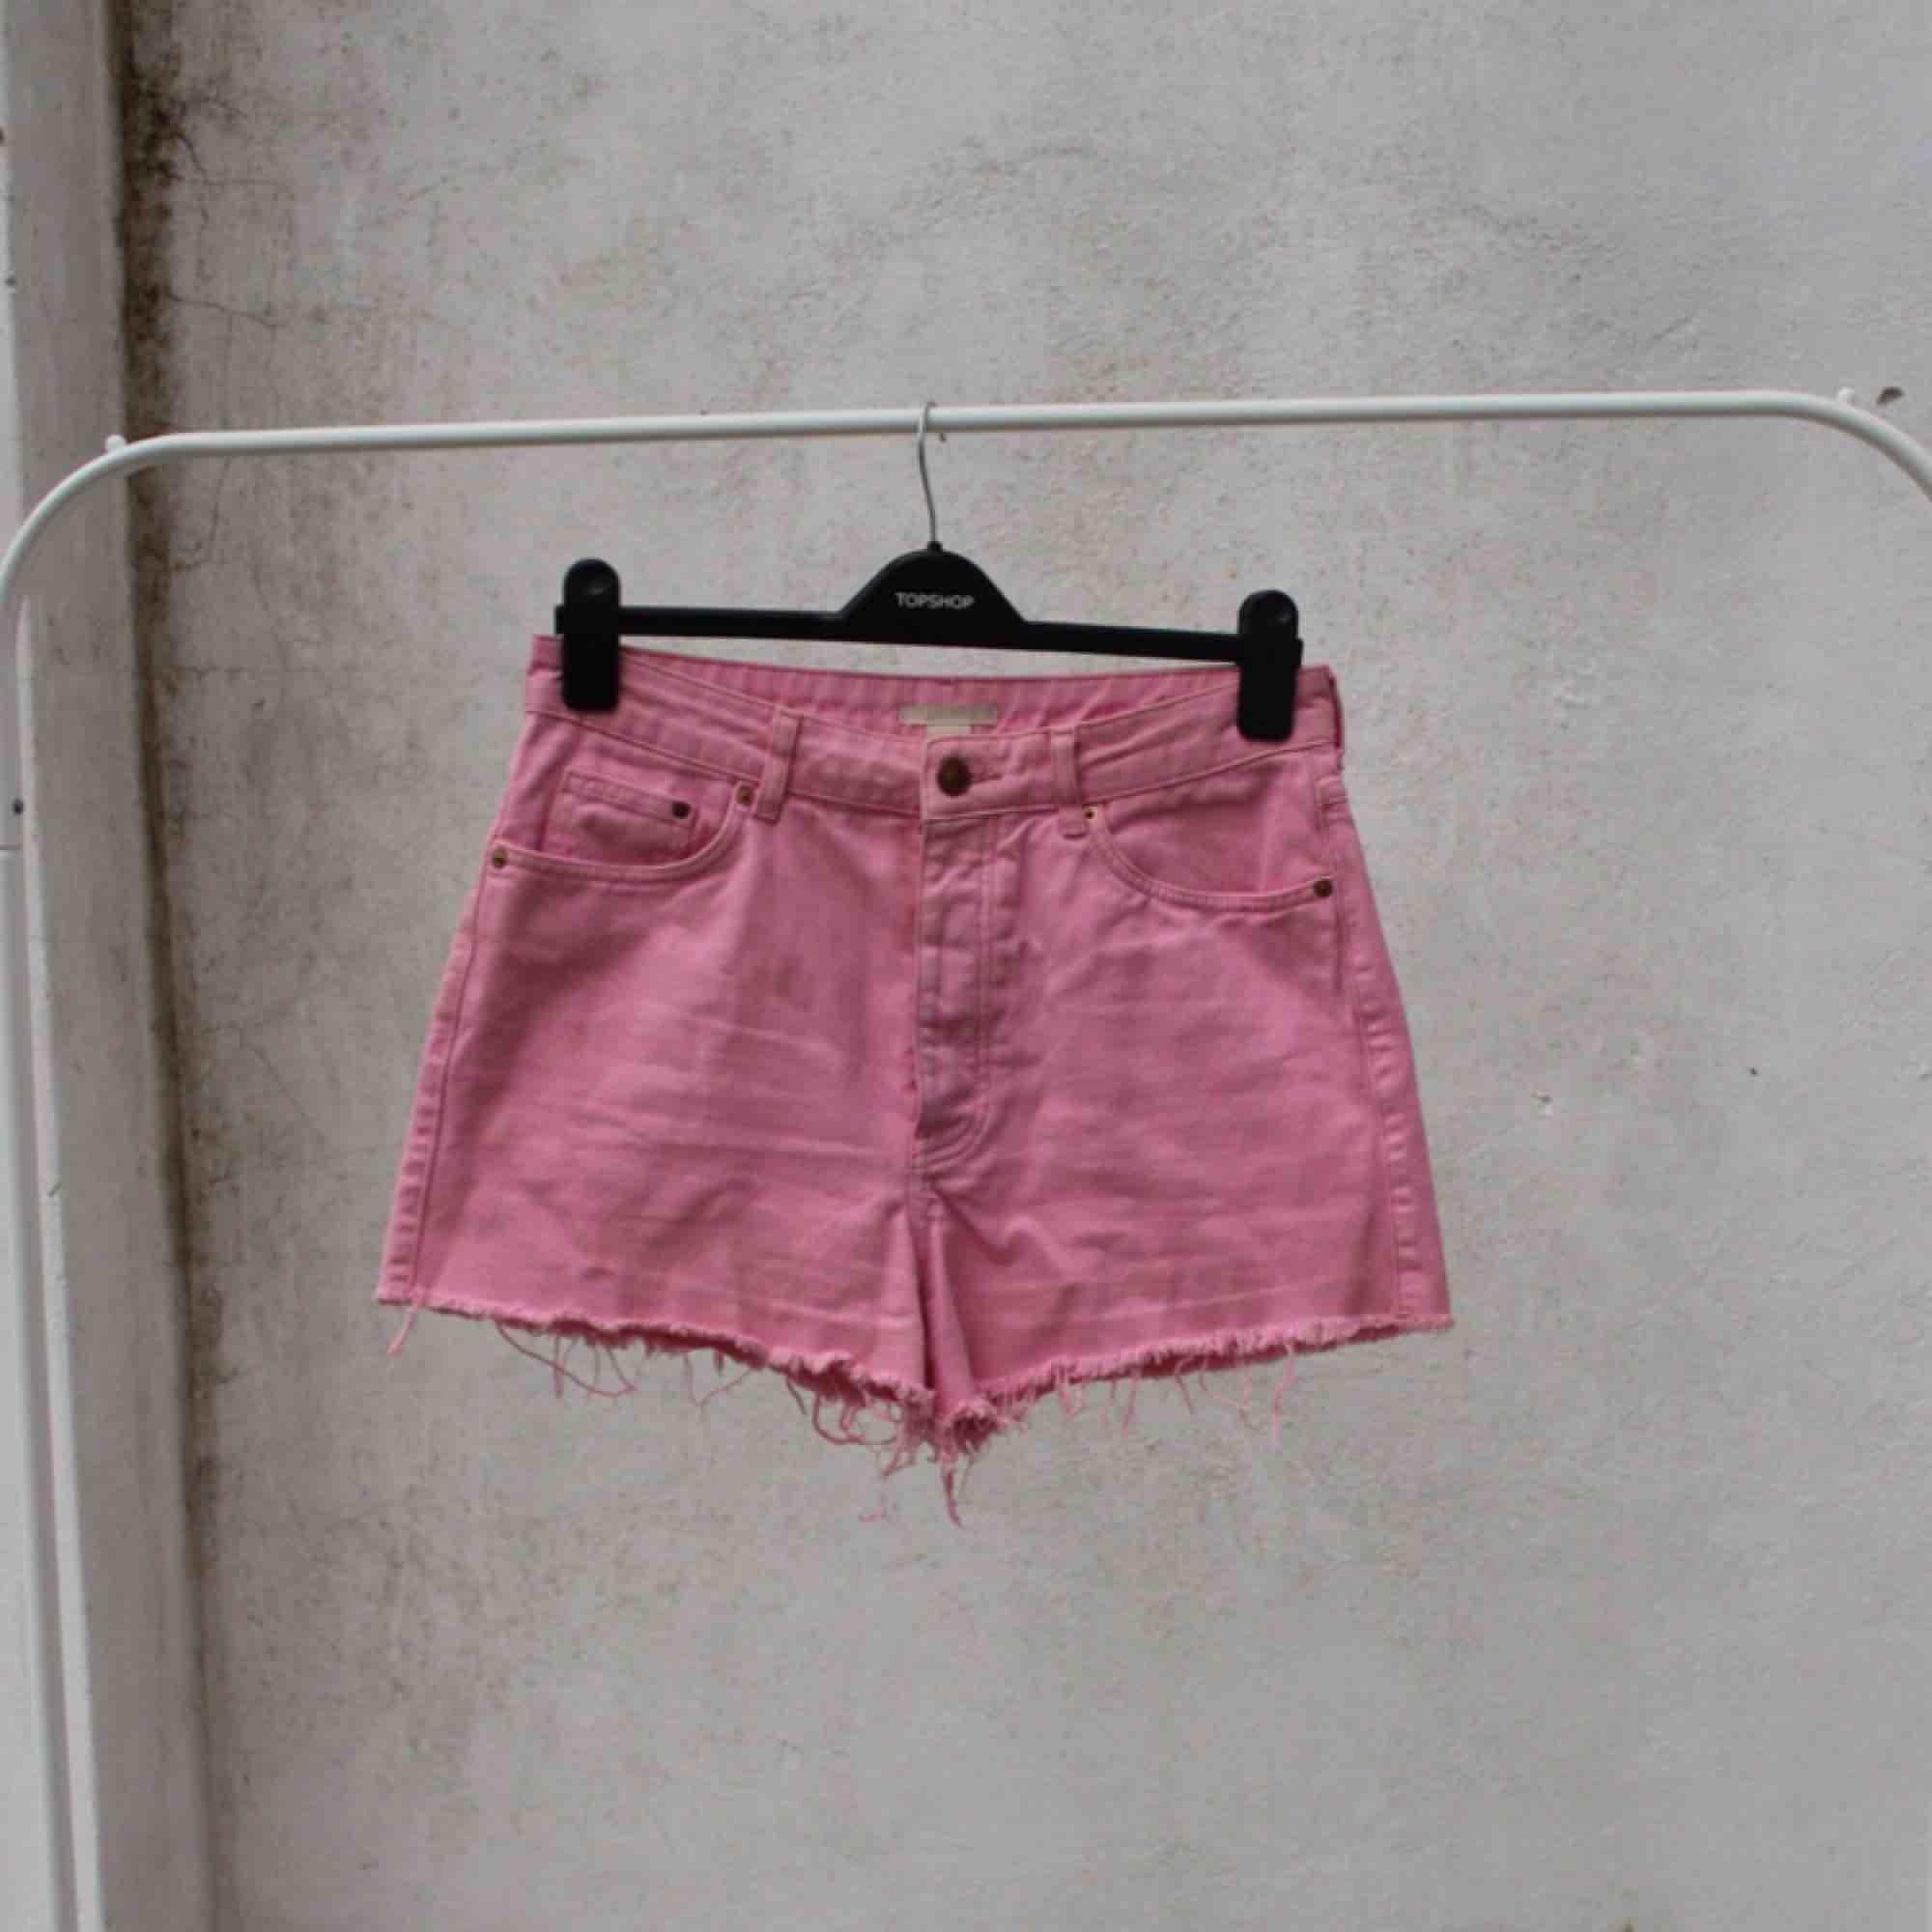 🌸 Rosa jeansshorts från H&M 🌸. Shorts.